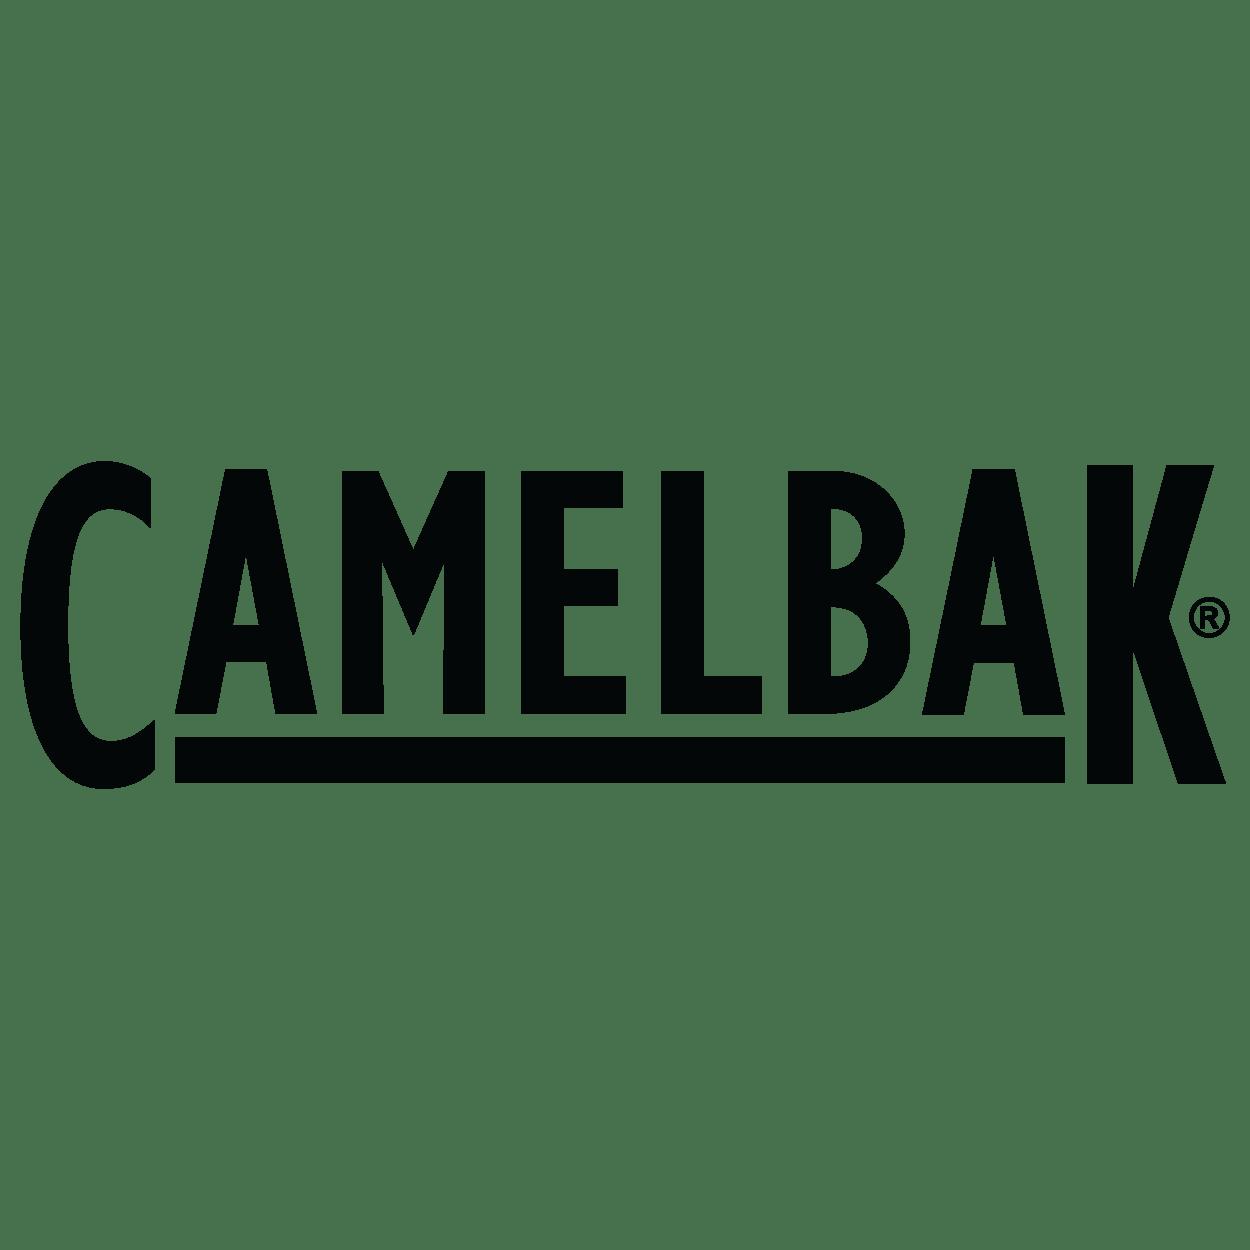 Camelbak Logo - Popular Brand Promotional Products